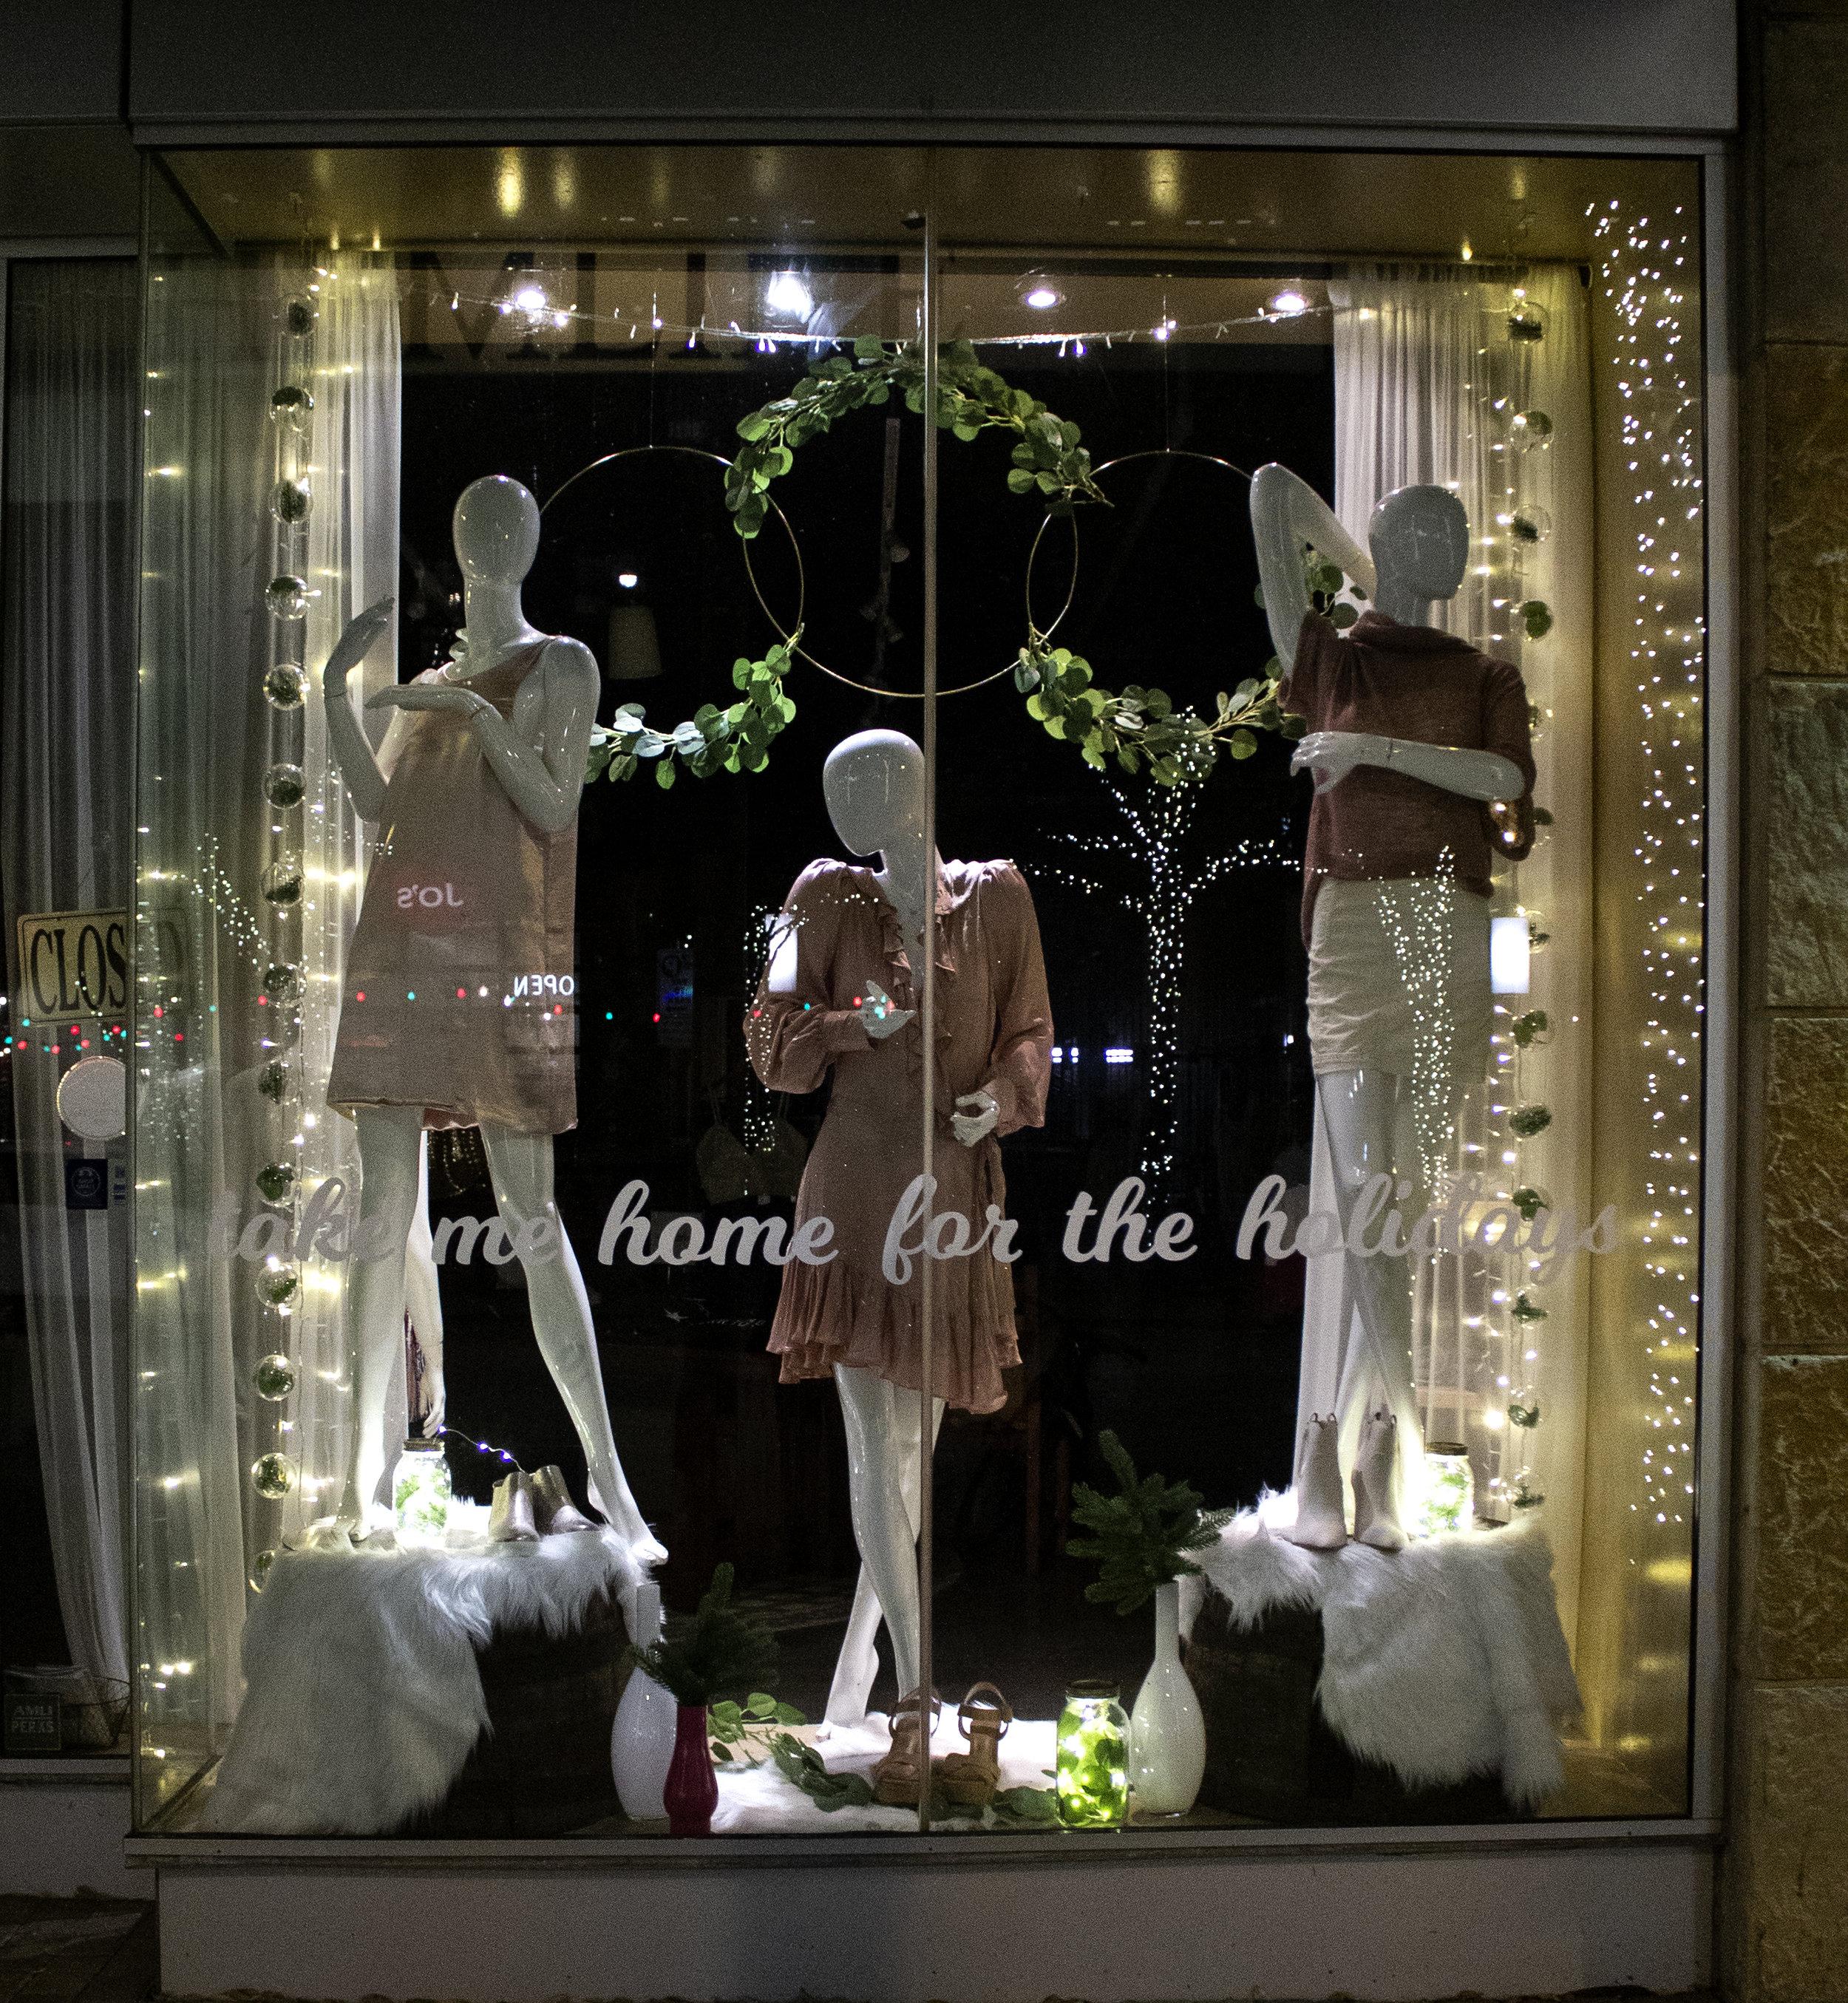 Hemline Window Display - window display design showcased in Austin's 2nd Street District during the winter holiday season